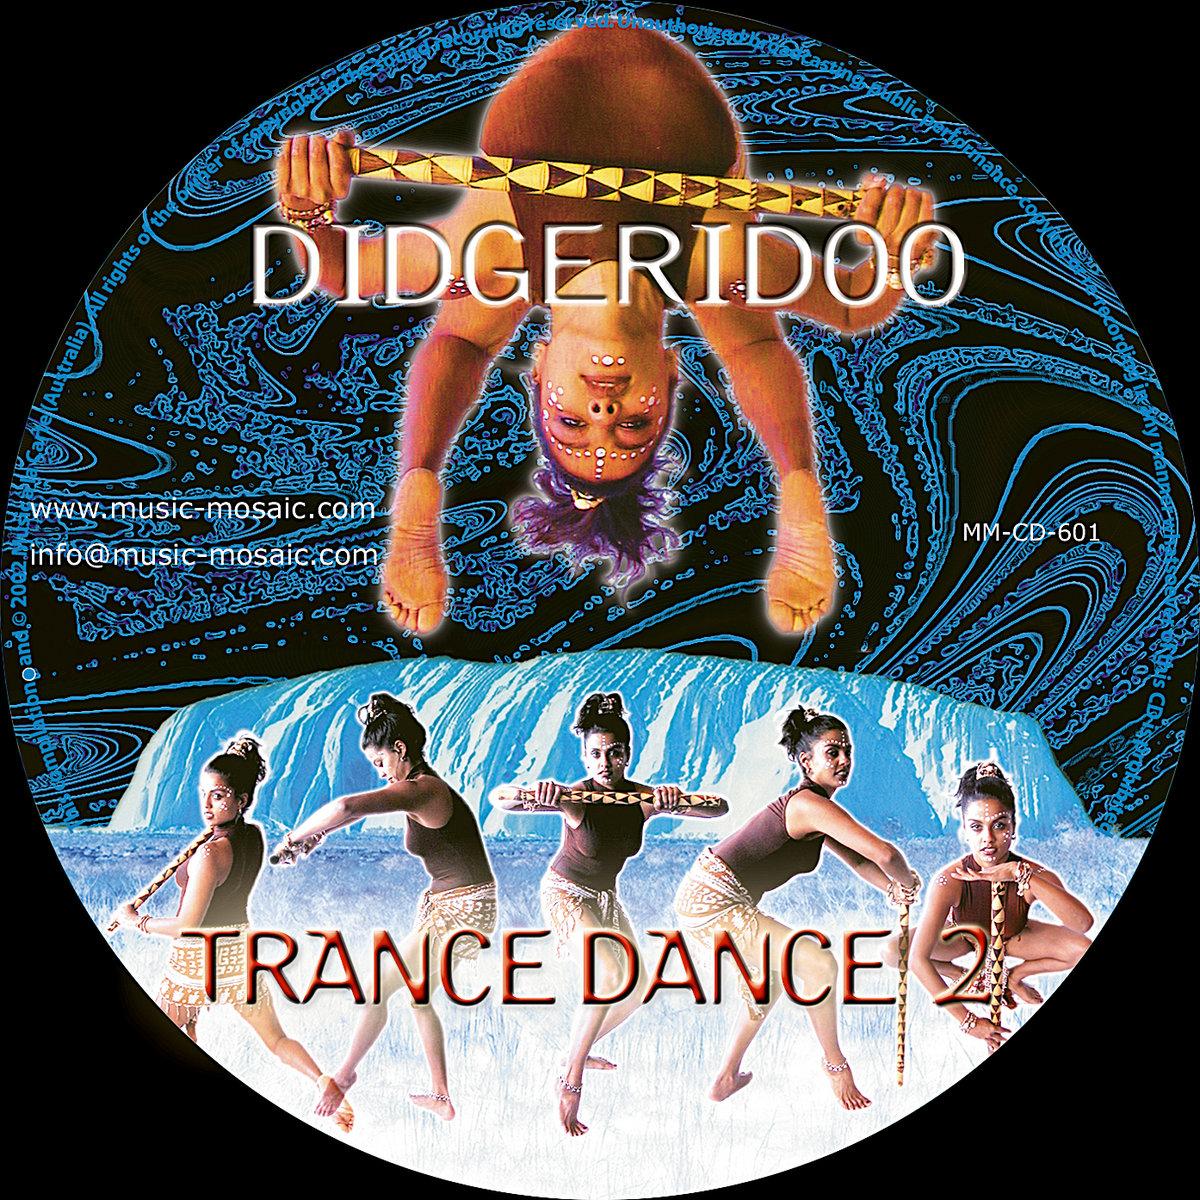 tribal trance mp3 download